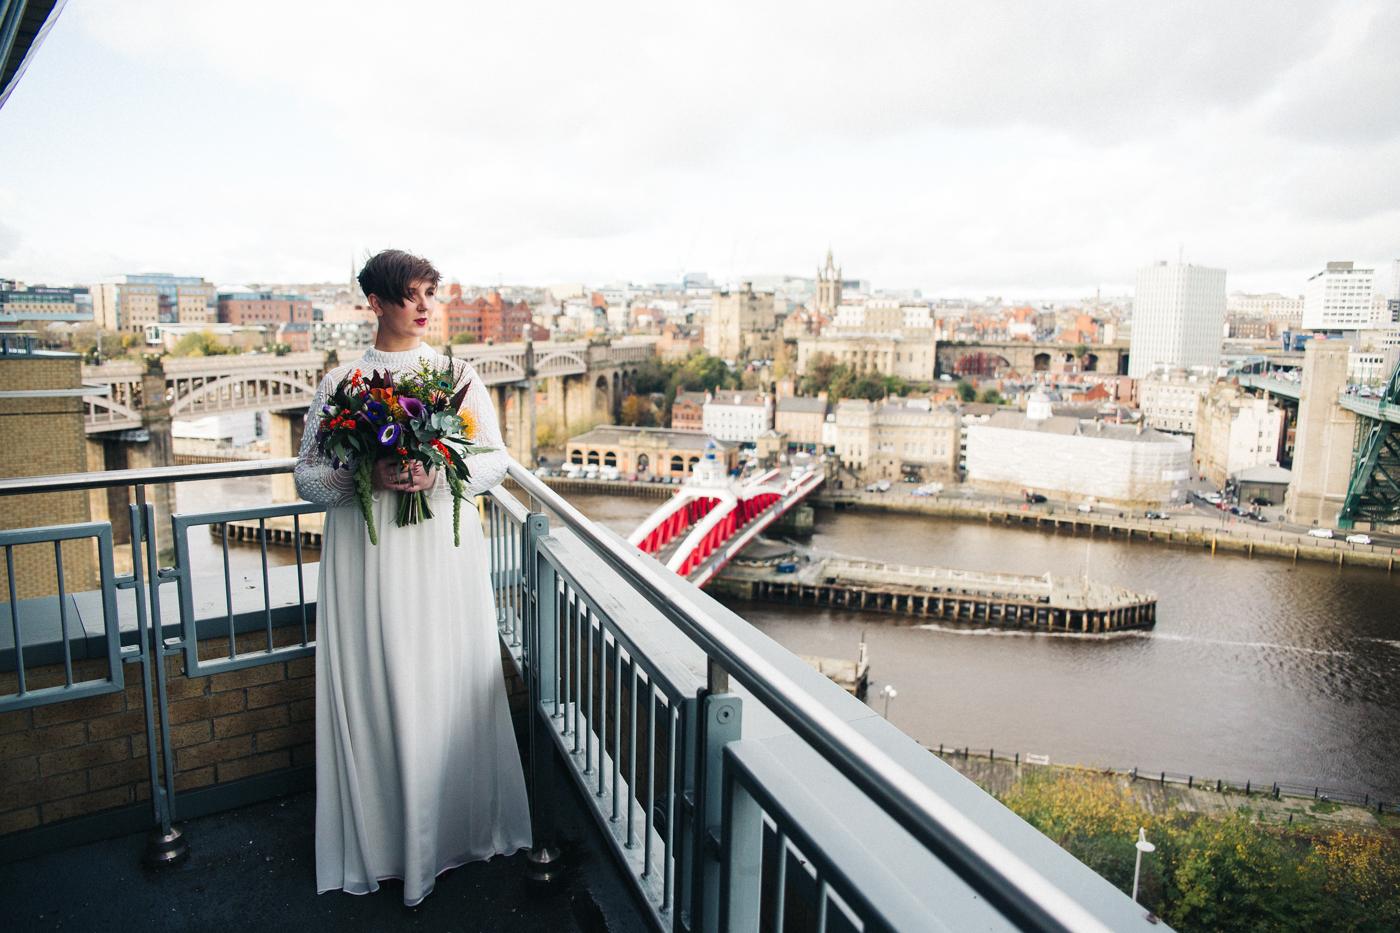 teesside-newcastle-gateshead-wedding-photography-photographer-creative-0019.jpg